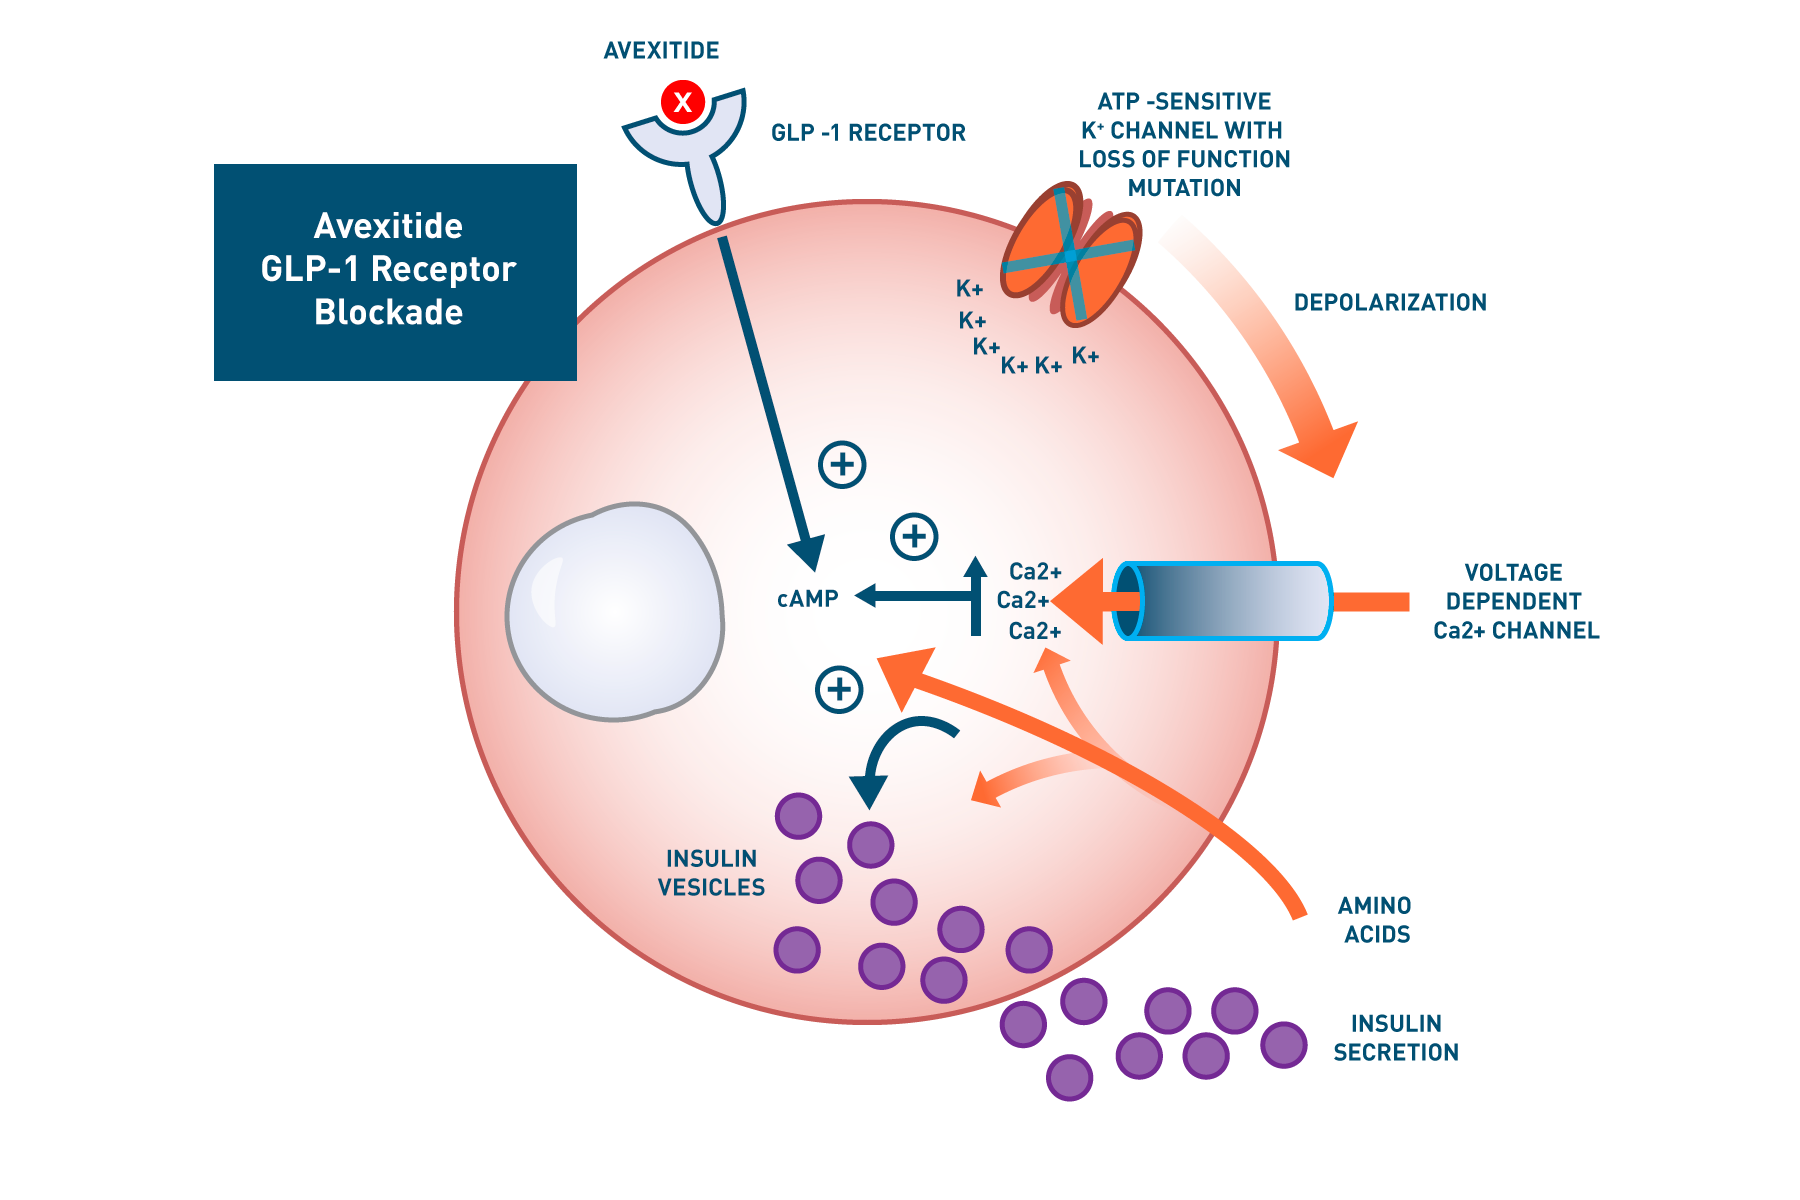 Avexitide Receptor